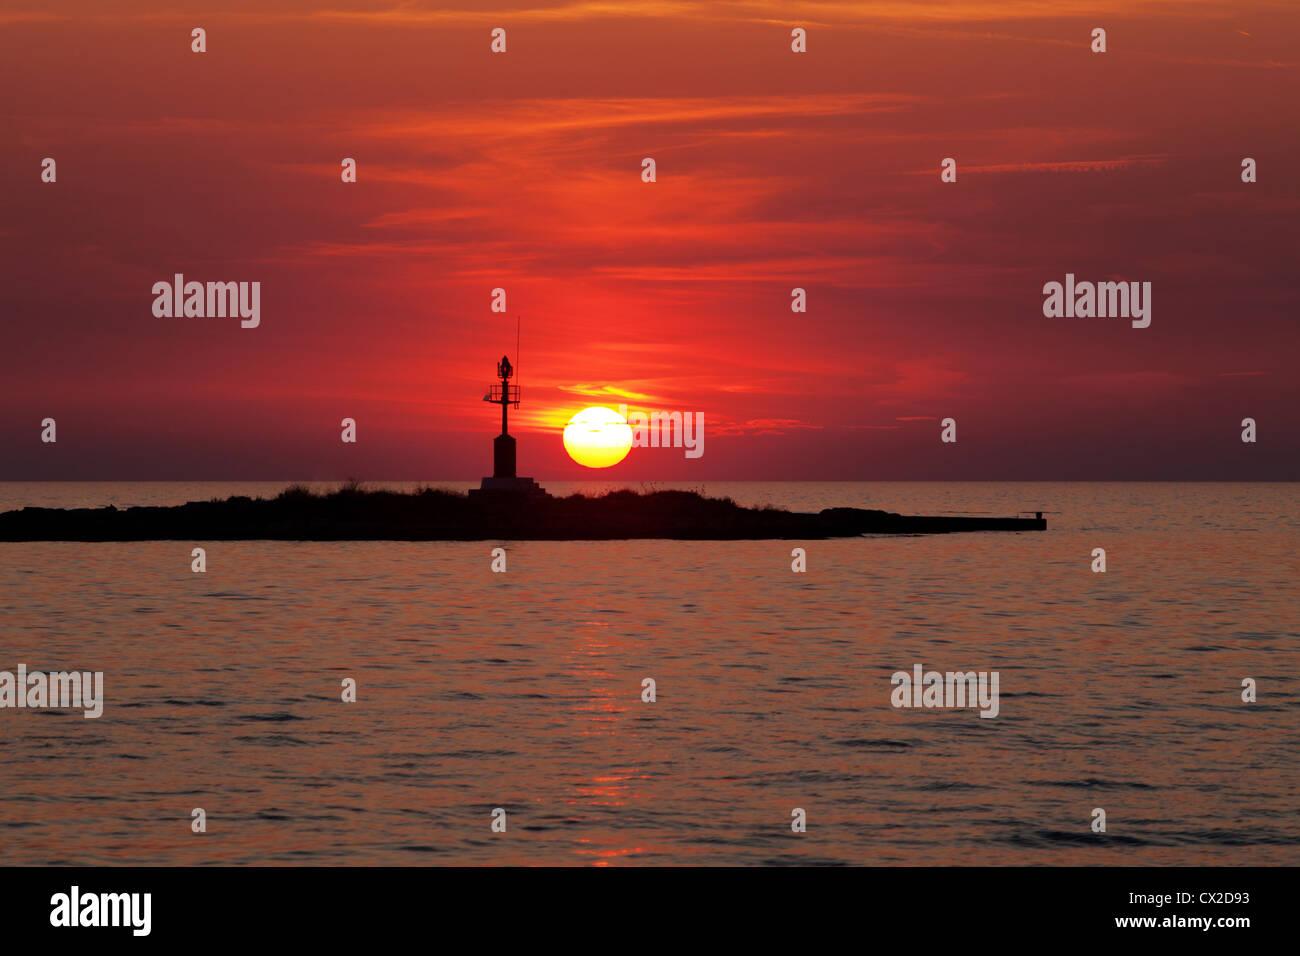 Europa, Kroatien, Porec - Sonnenuntergang, Segelschiff Segelboot bei Sonnenuntergang Schiff Schiffe Adria MeerEuropa Stockbild